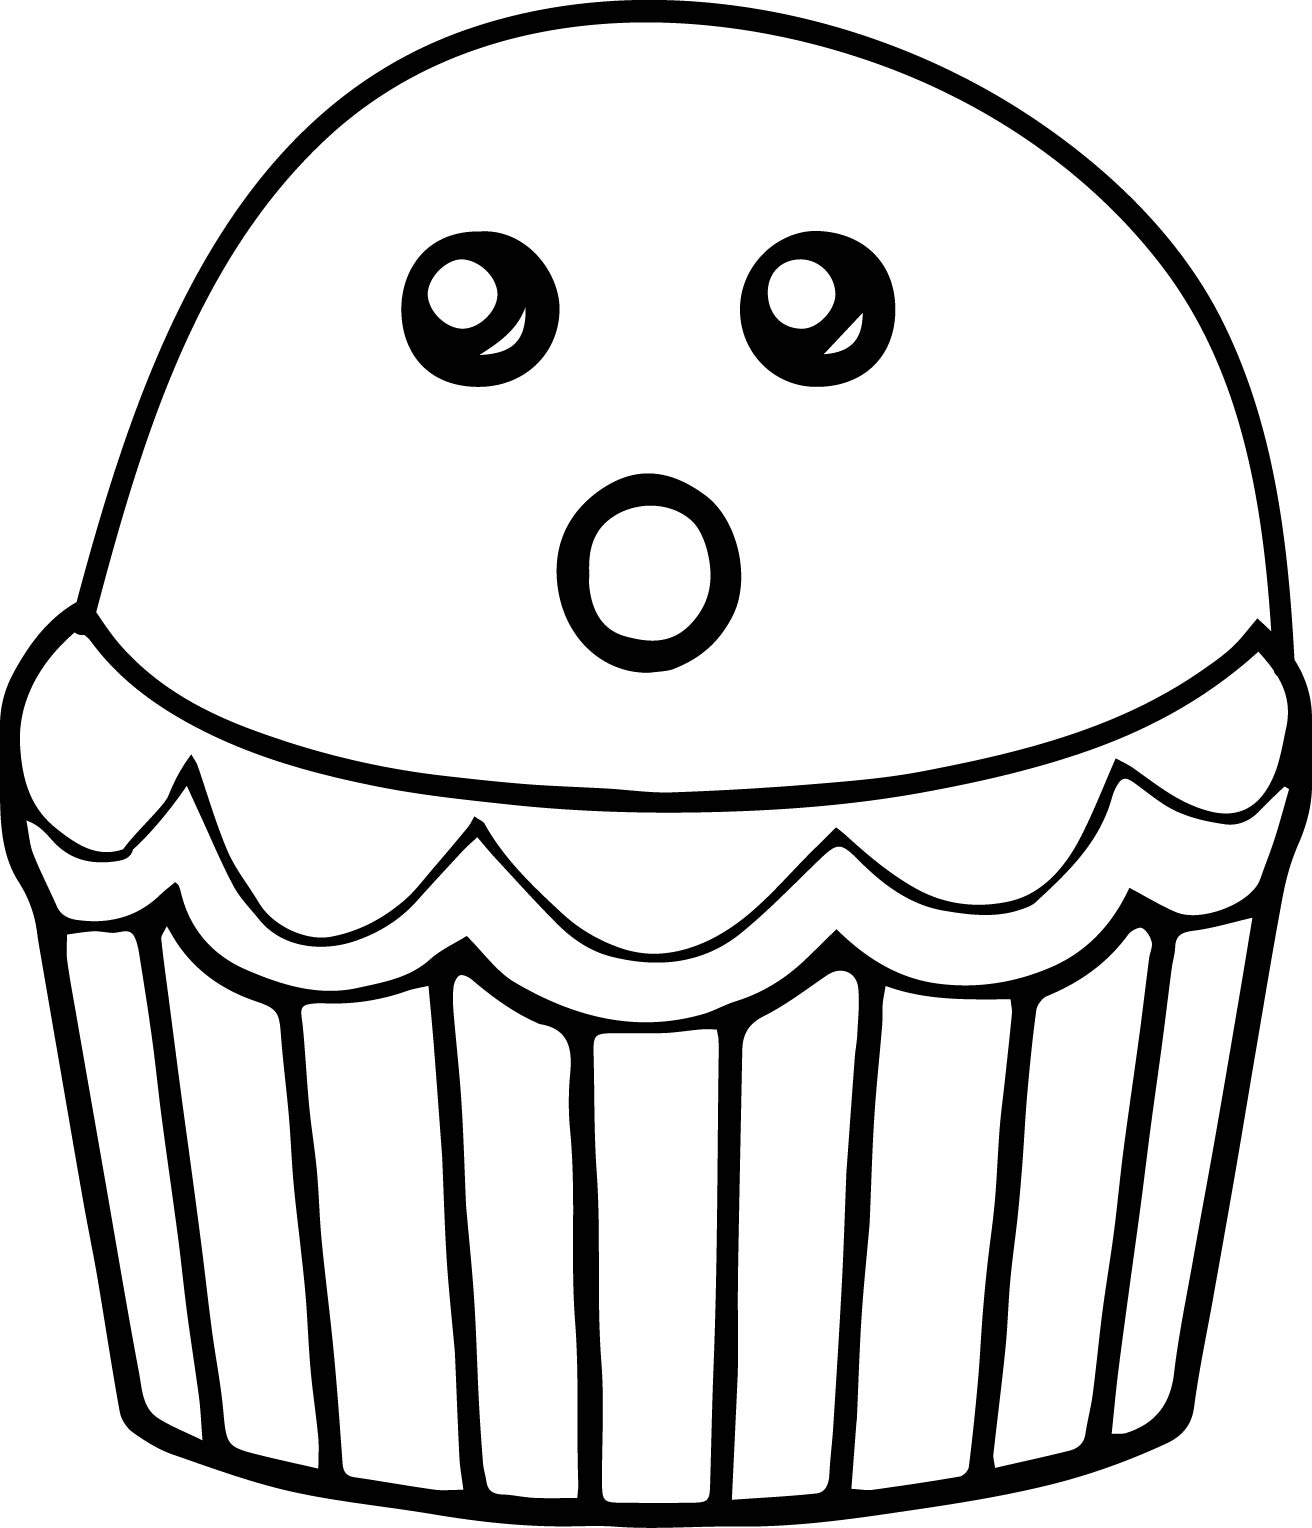 Cupcake Cartoon Drawing At Getdrawings